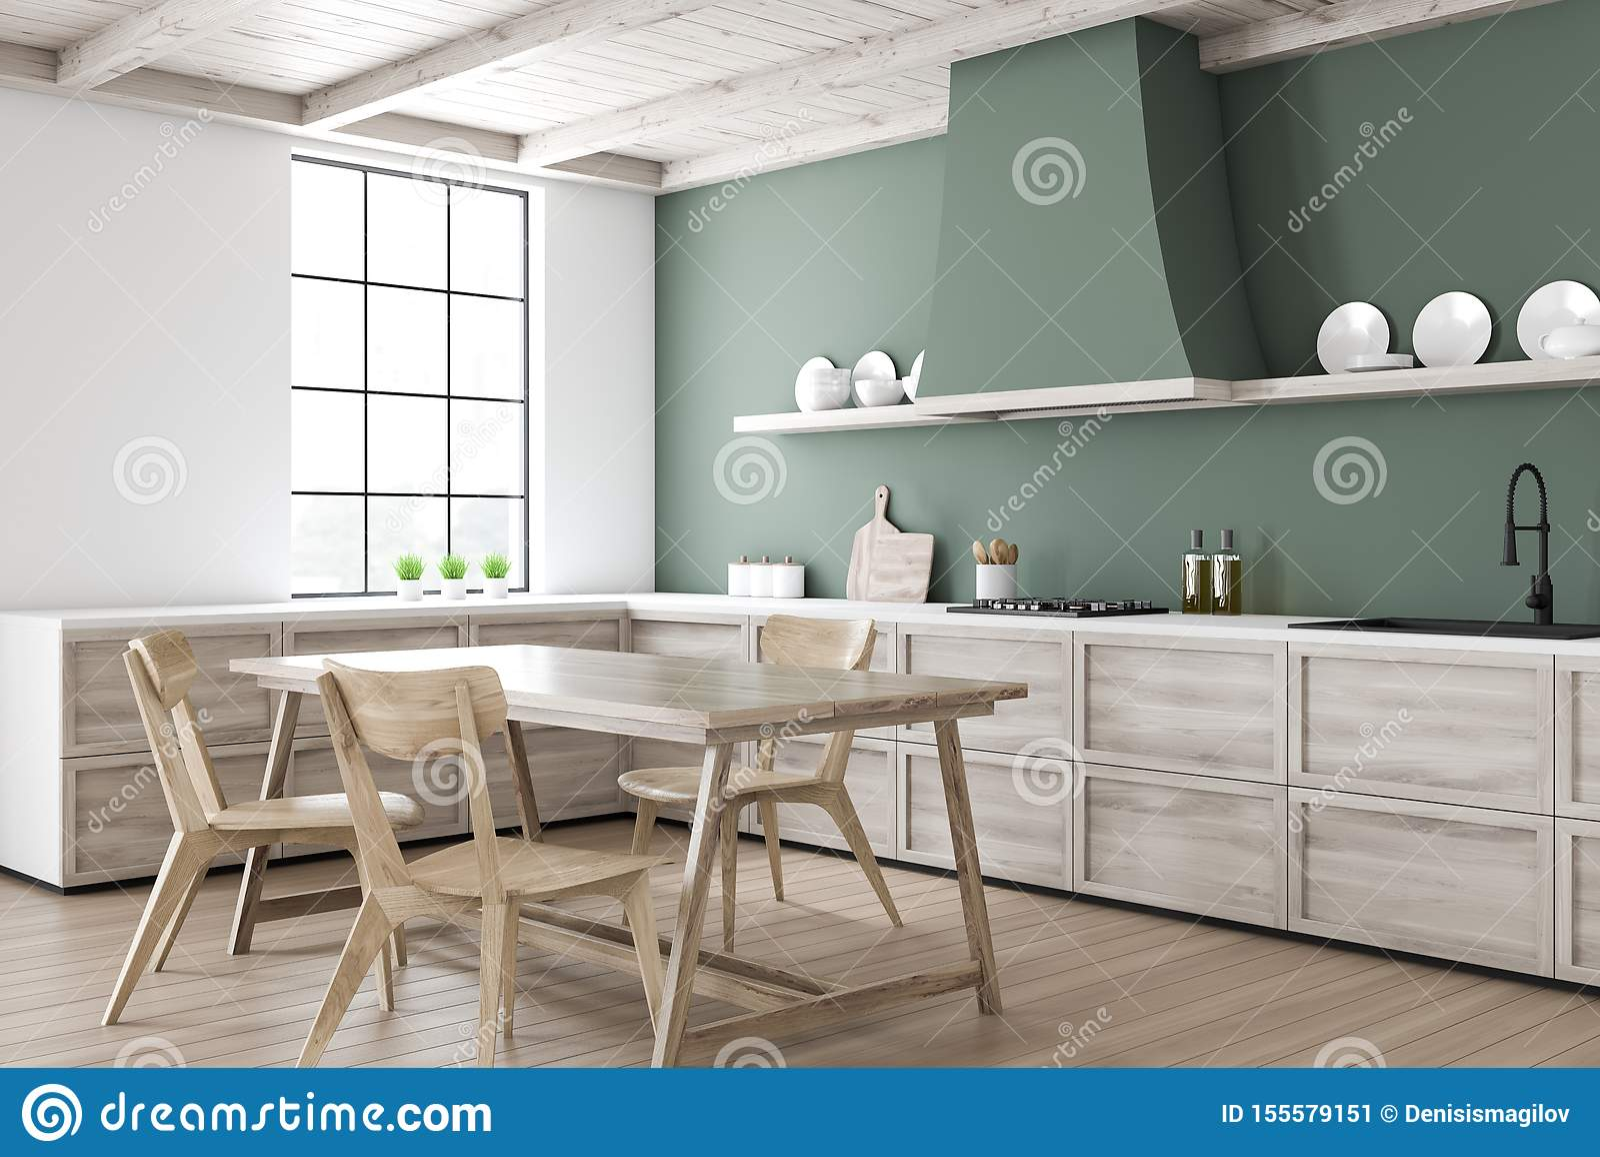 Green Kitchen Corner With Dining Table Stock Illustration Illustration Of Dark Home 155579151